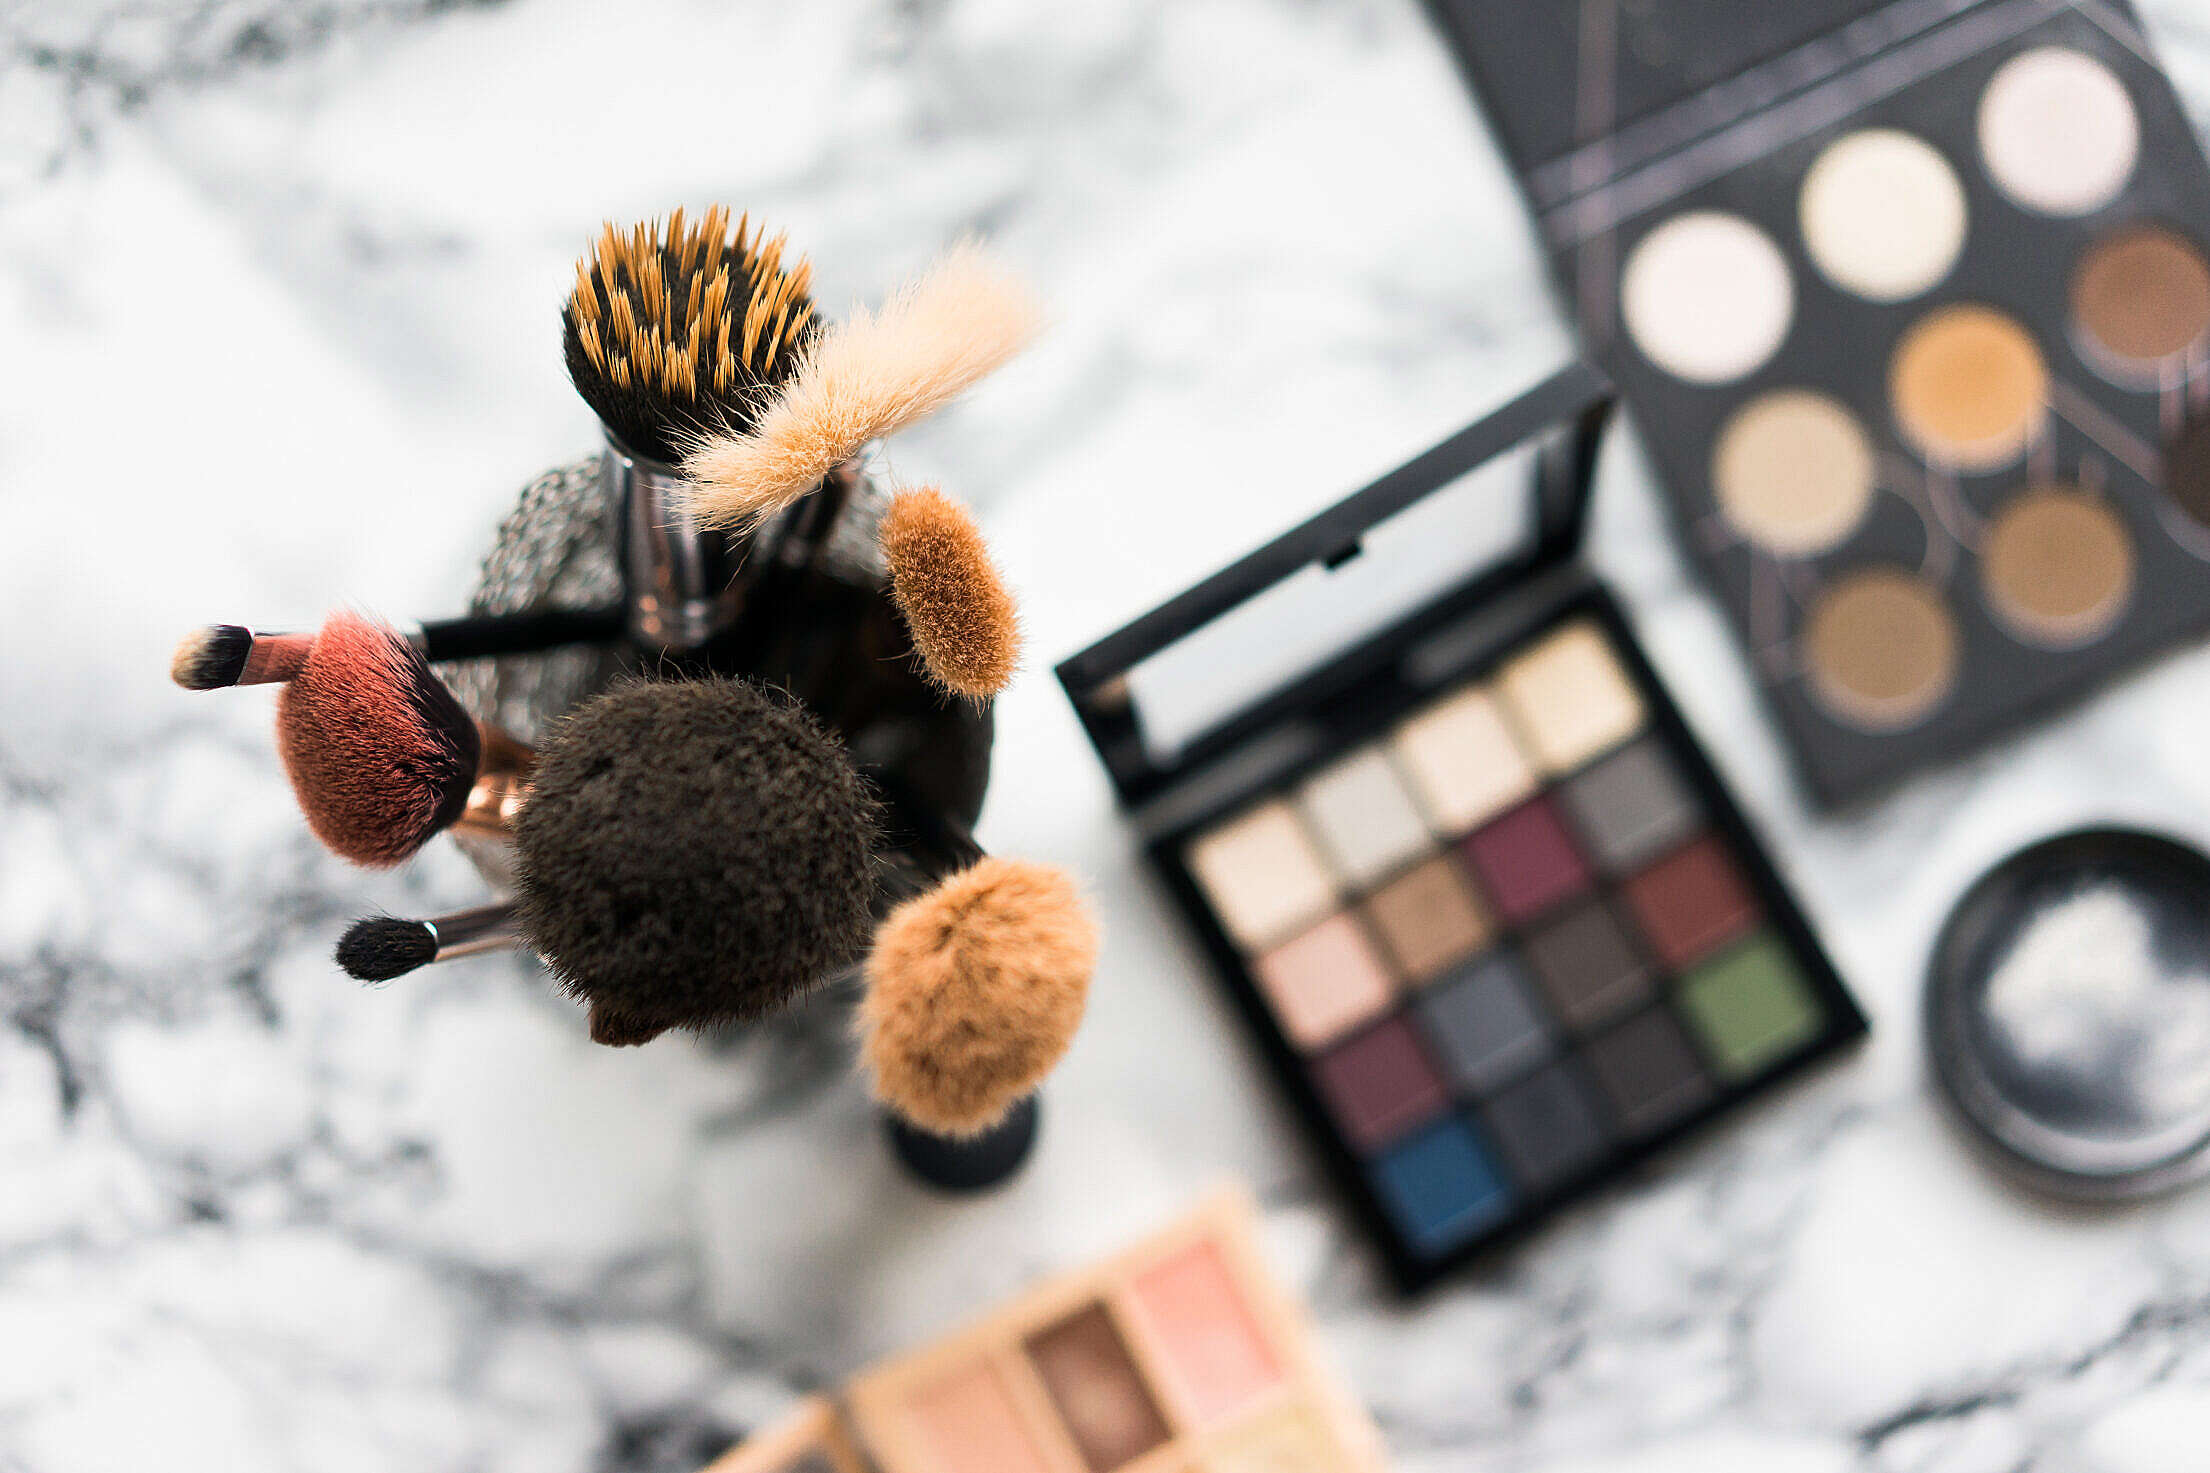 Makeup Brushes Free Stock Photo